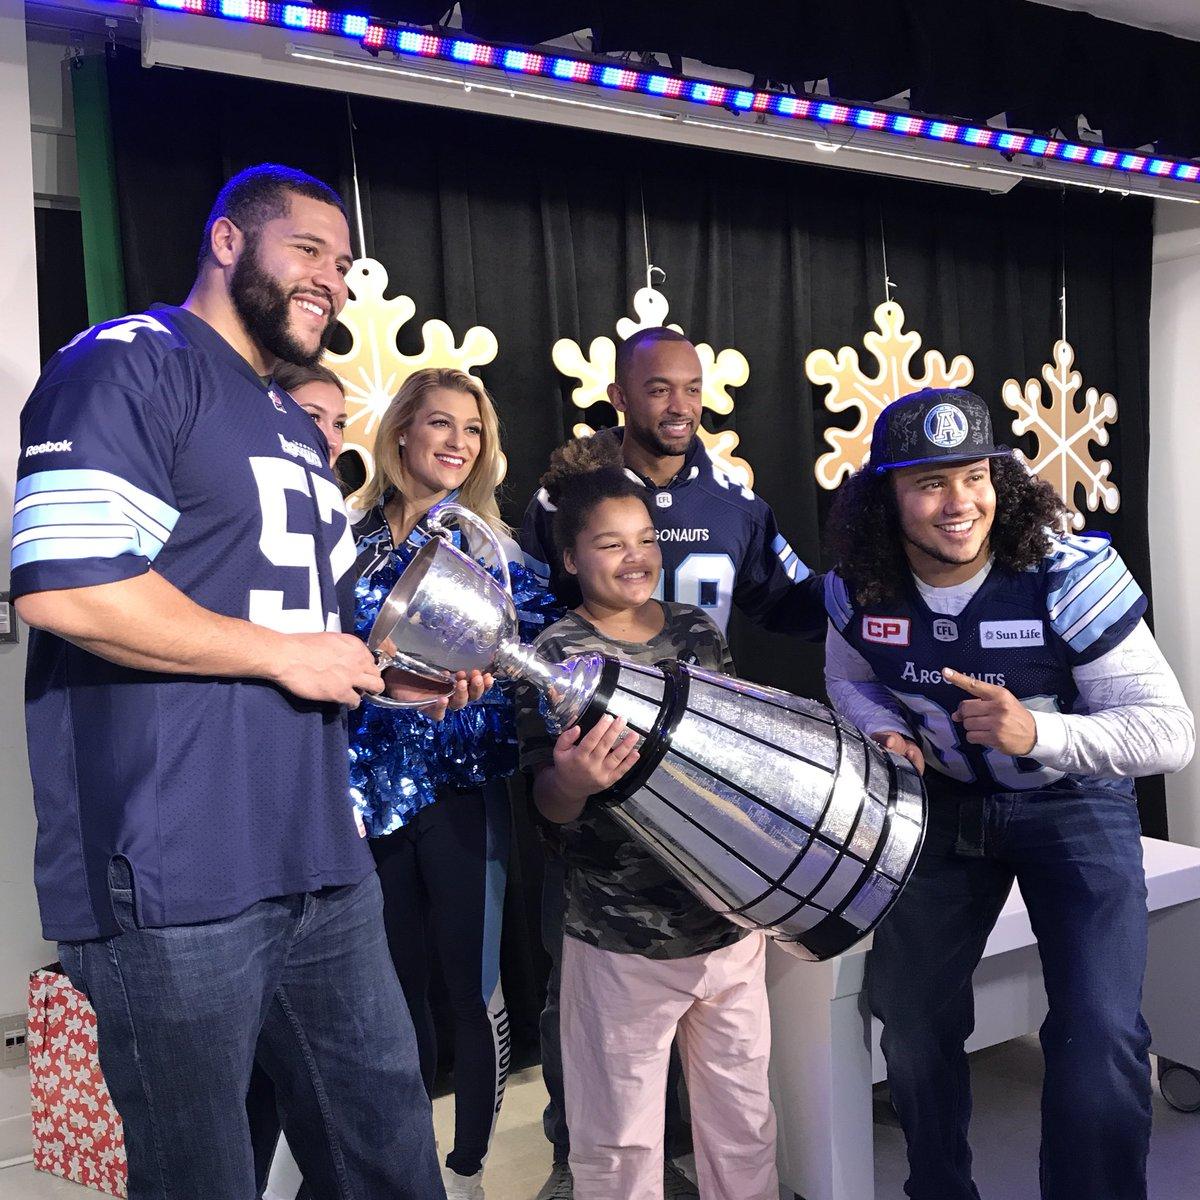 RT @TorontoArgos: We met the real champs today @sickkids 🏆  #ArgosFootball #GreyCup https://t.co/MEqZtyPp9a